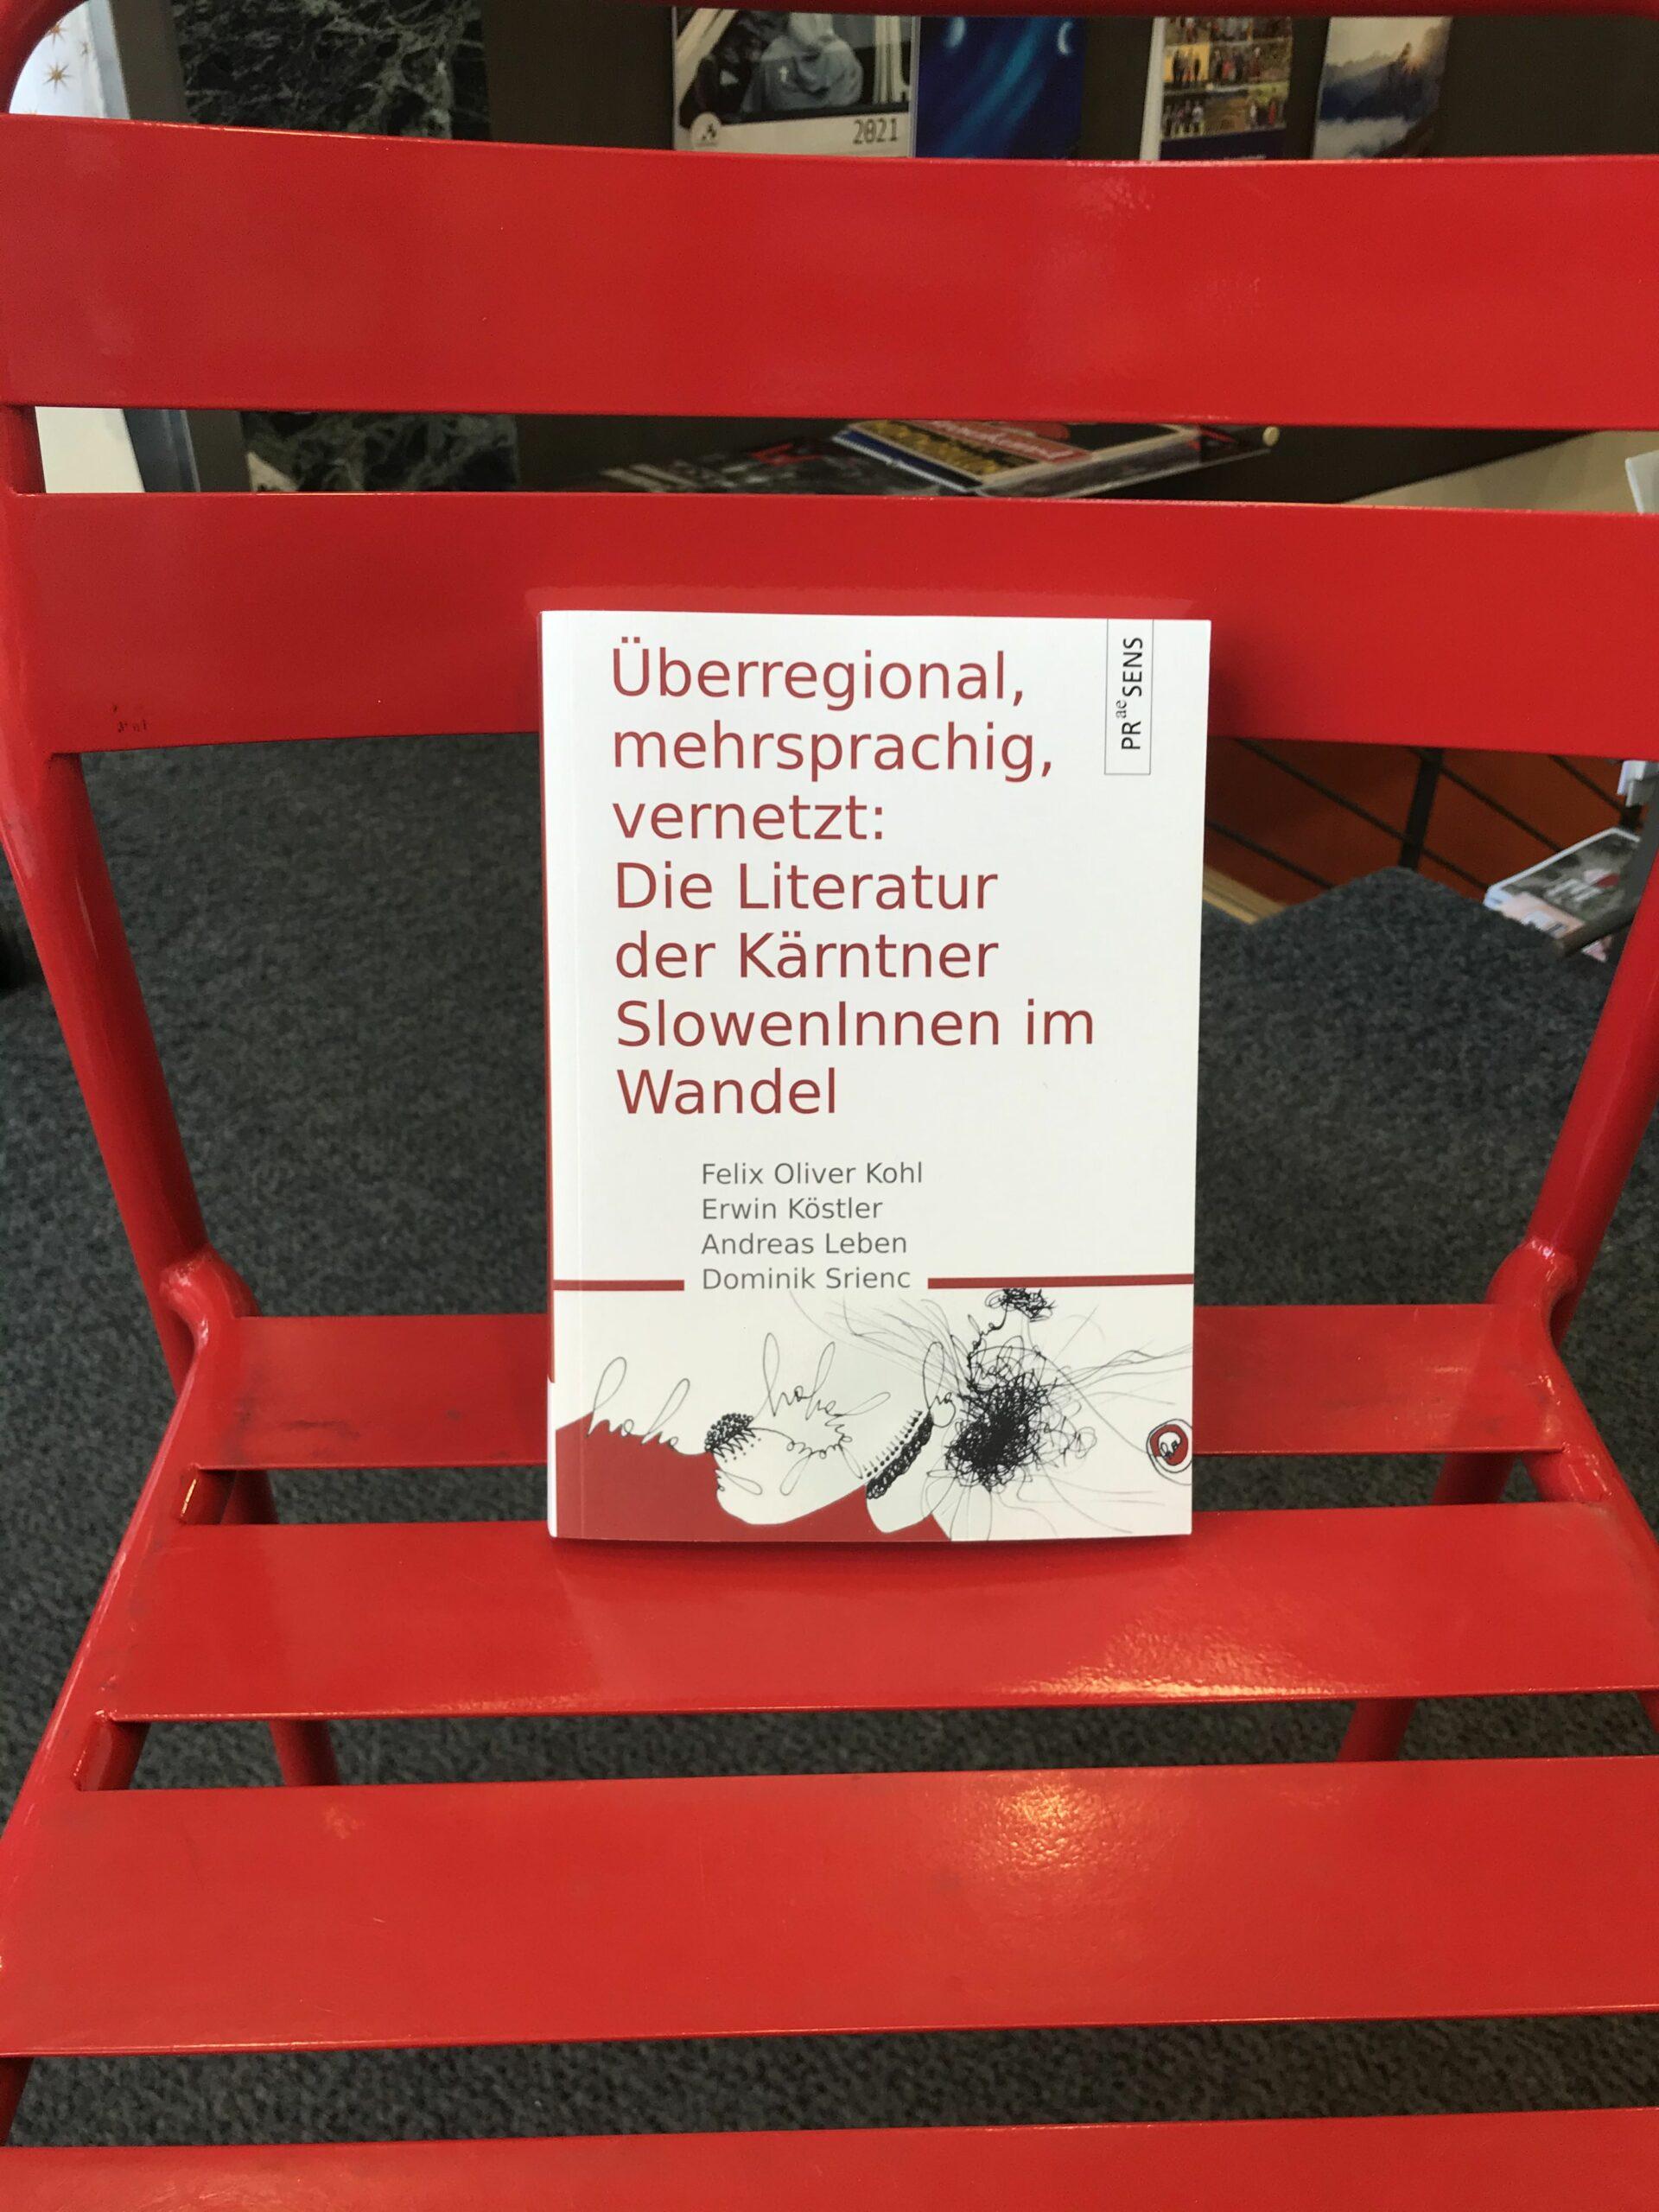 ❗️Naprodaj v naši knjigarni / Seit heute in unserer Buchhandlung erhältlich❗️